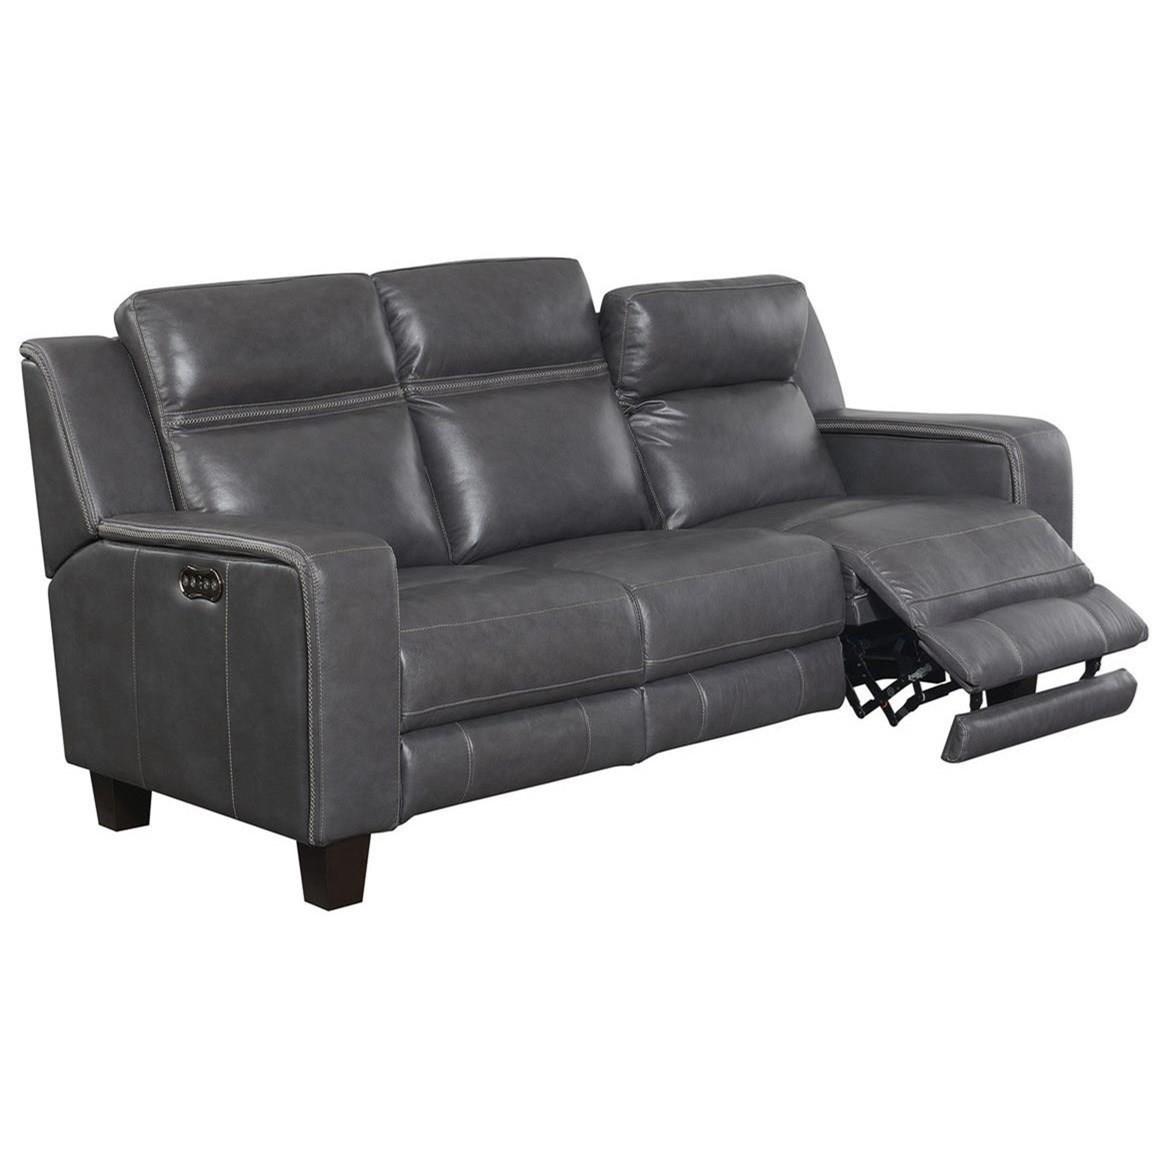 Beckett Power Sofa W/2 Power Headrests by Emerald at Northeast Factory Direct